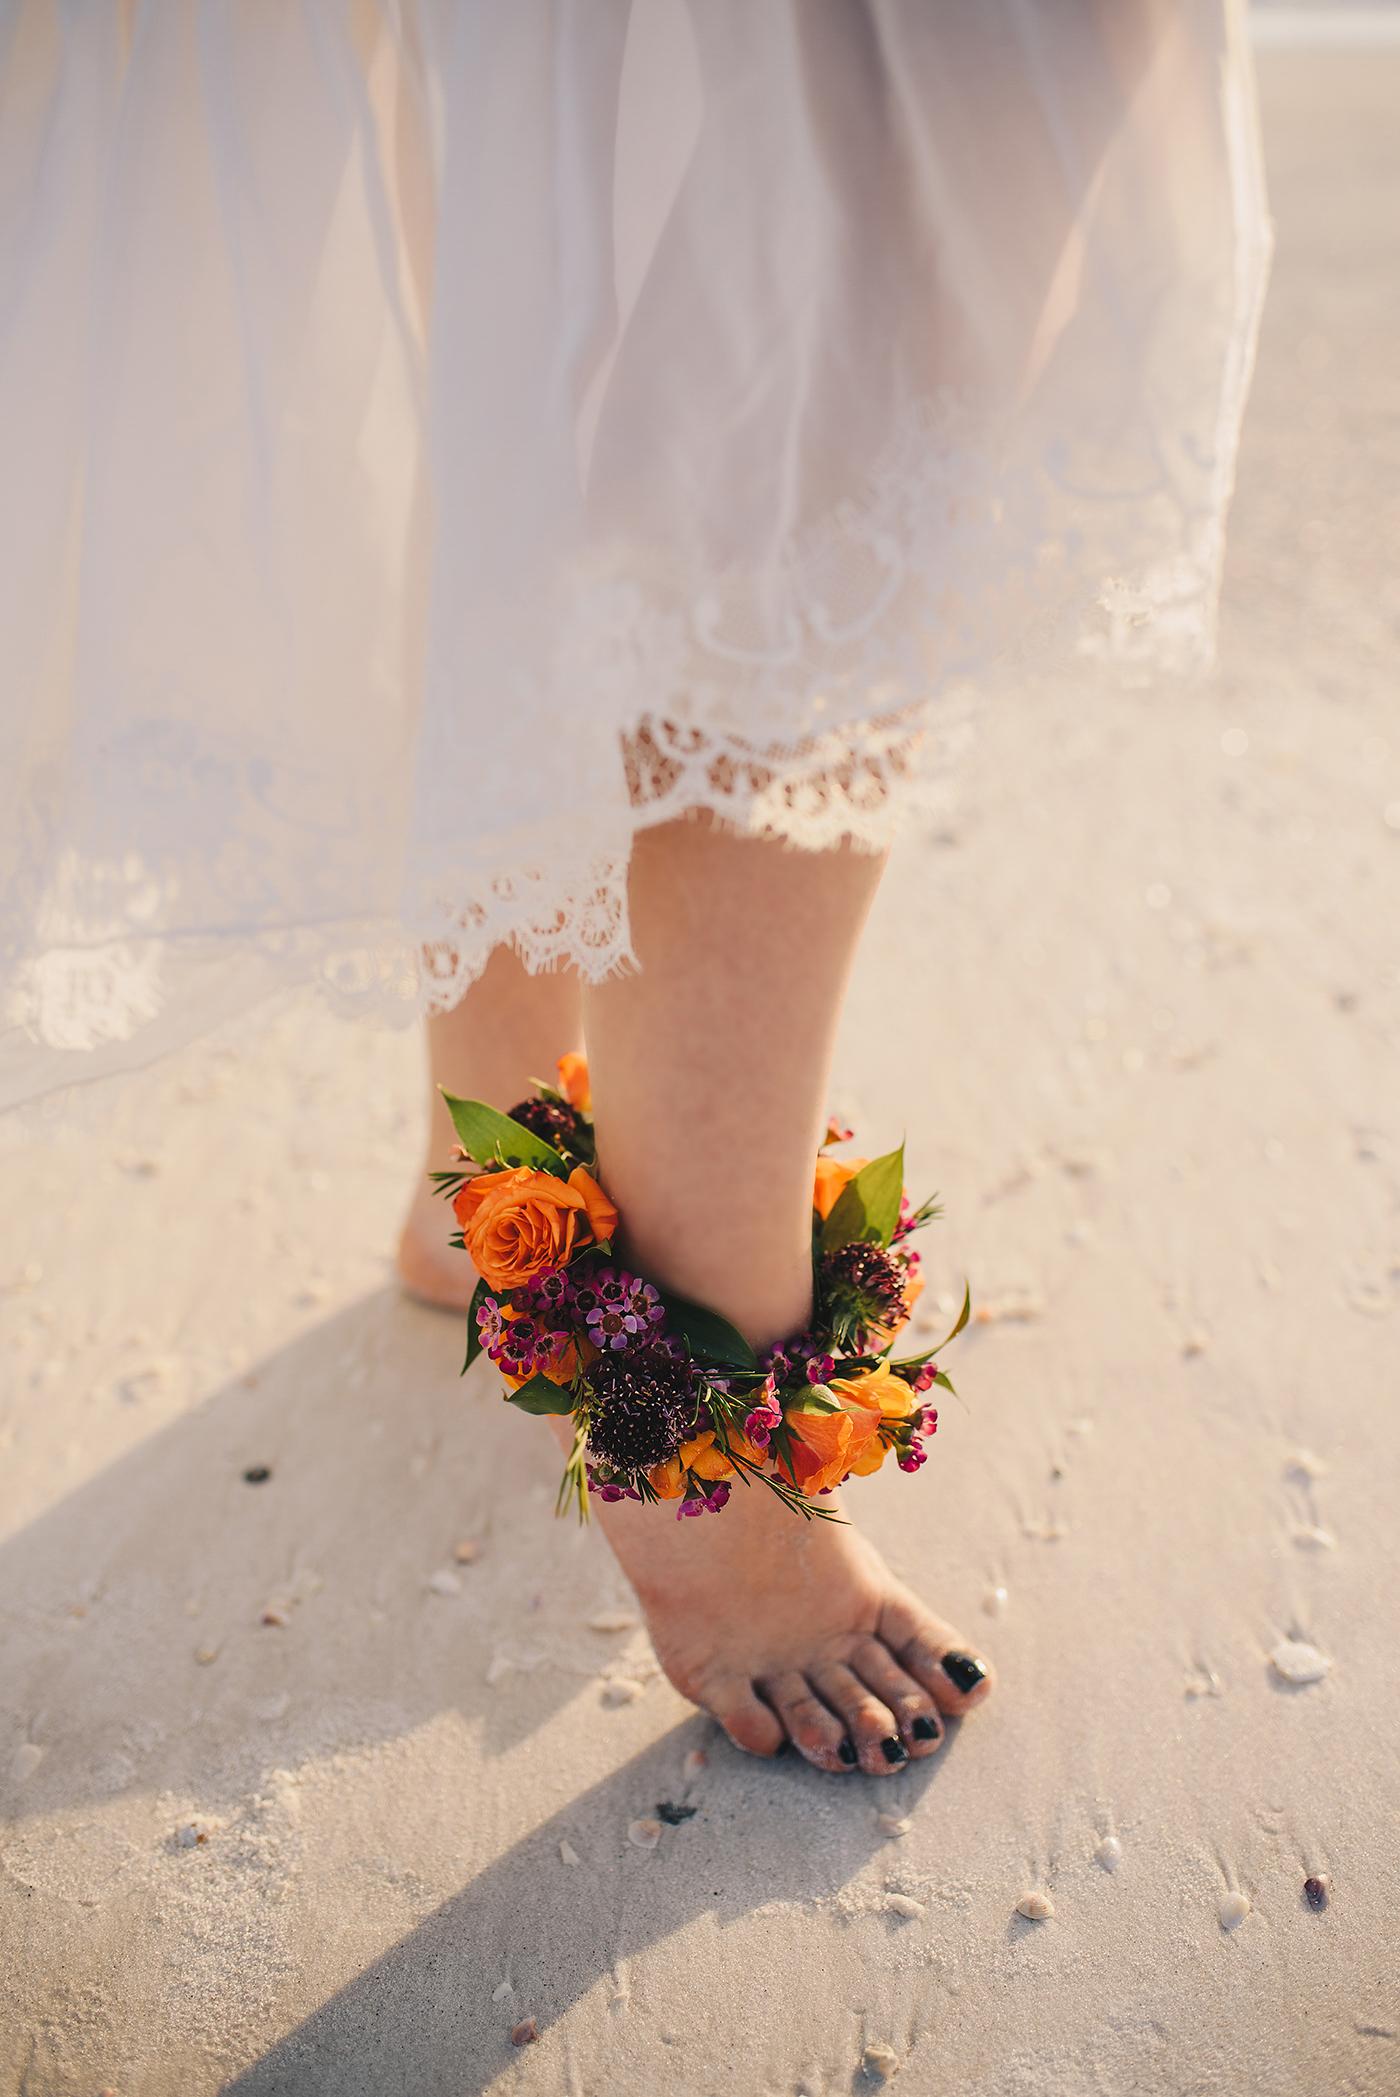 Los-Vargas-Photo-Moana-Wedding-Style-shoot-64.jpg